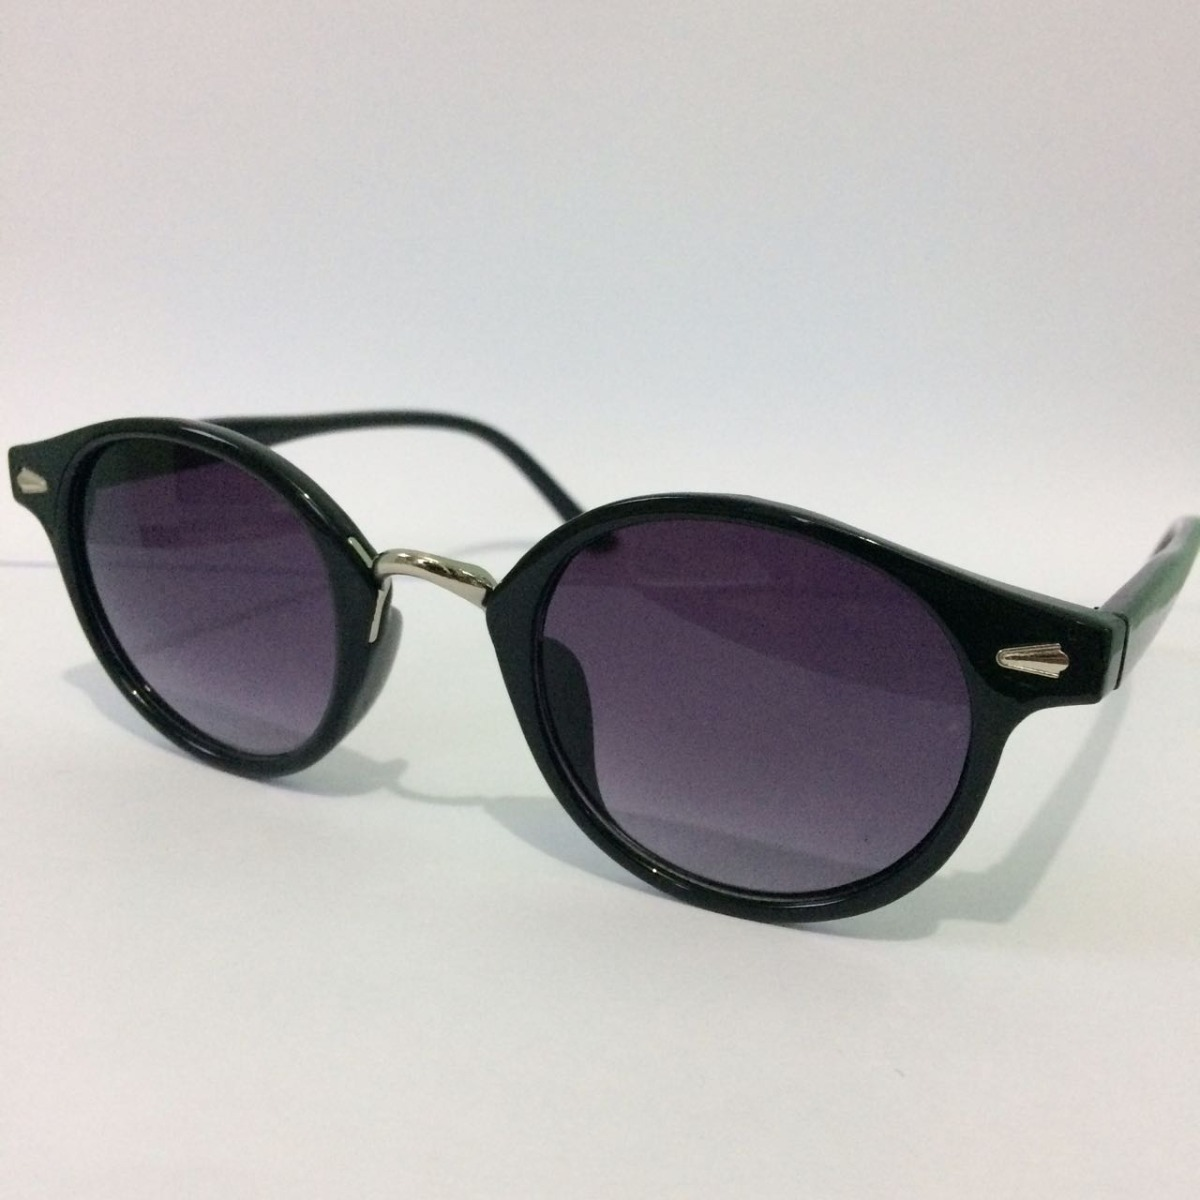 Óculos De Sol Feminino Redondo Com Lente Roxa Vintage - R  20,00 em ... b1db2b285d